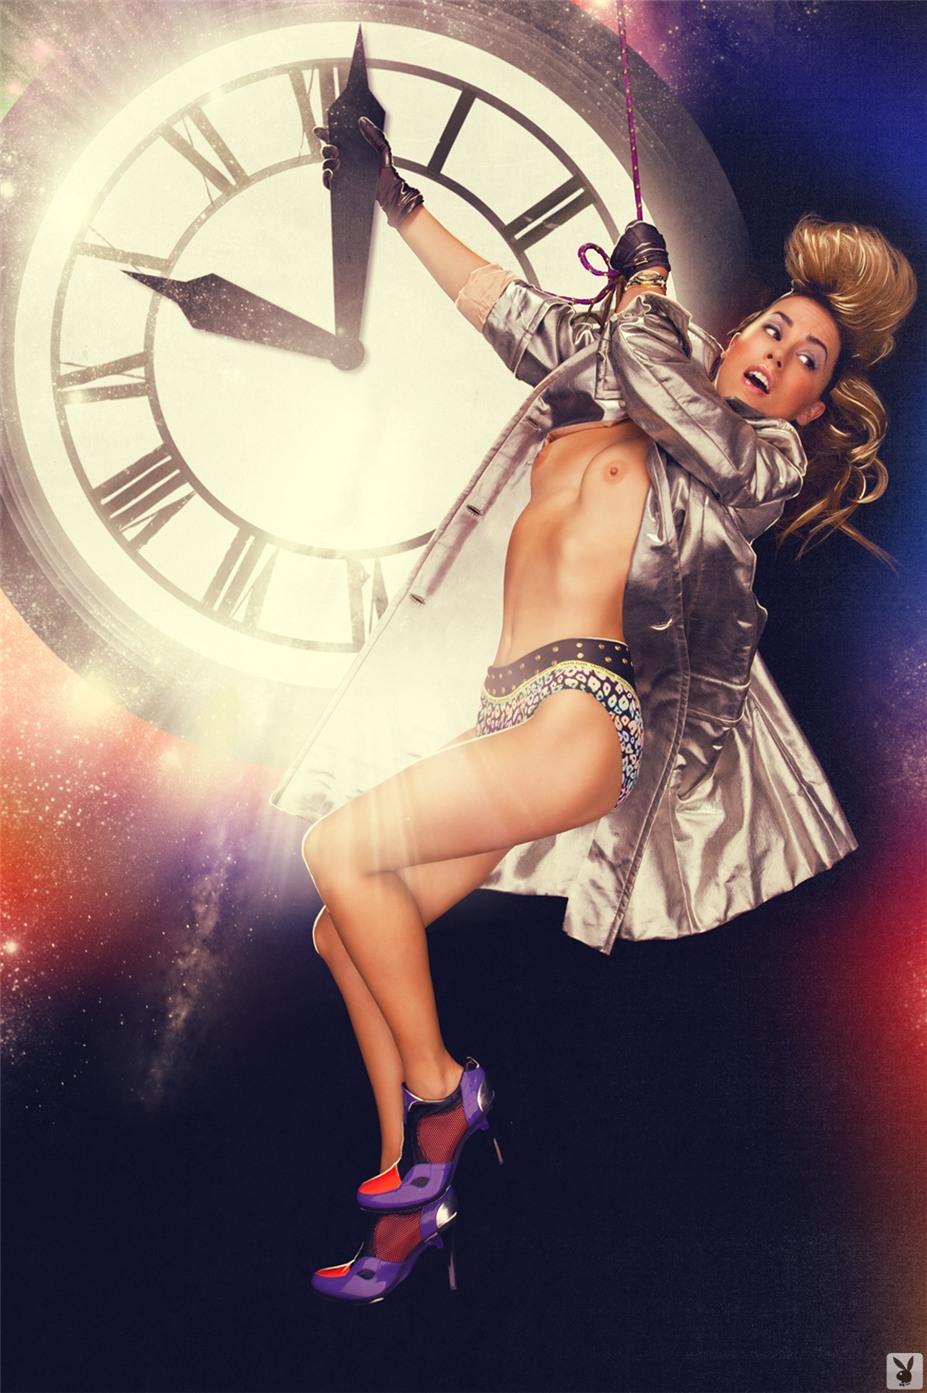 Назад в будущее - Playboy Goes Back - Jessica Hall & Kimberly Phillips